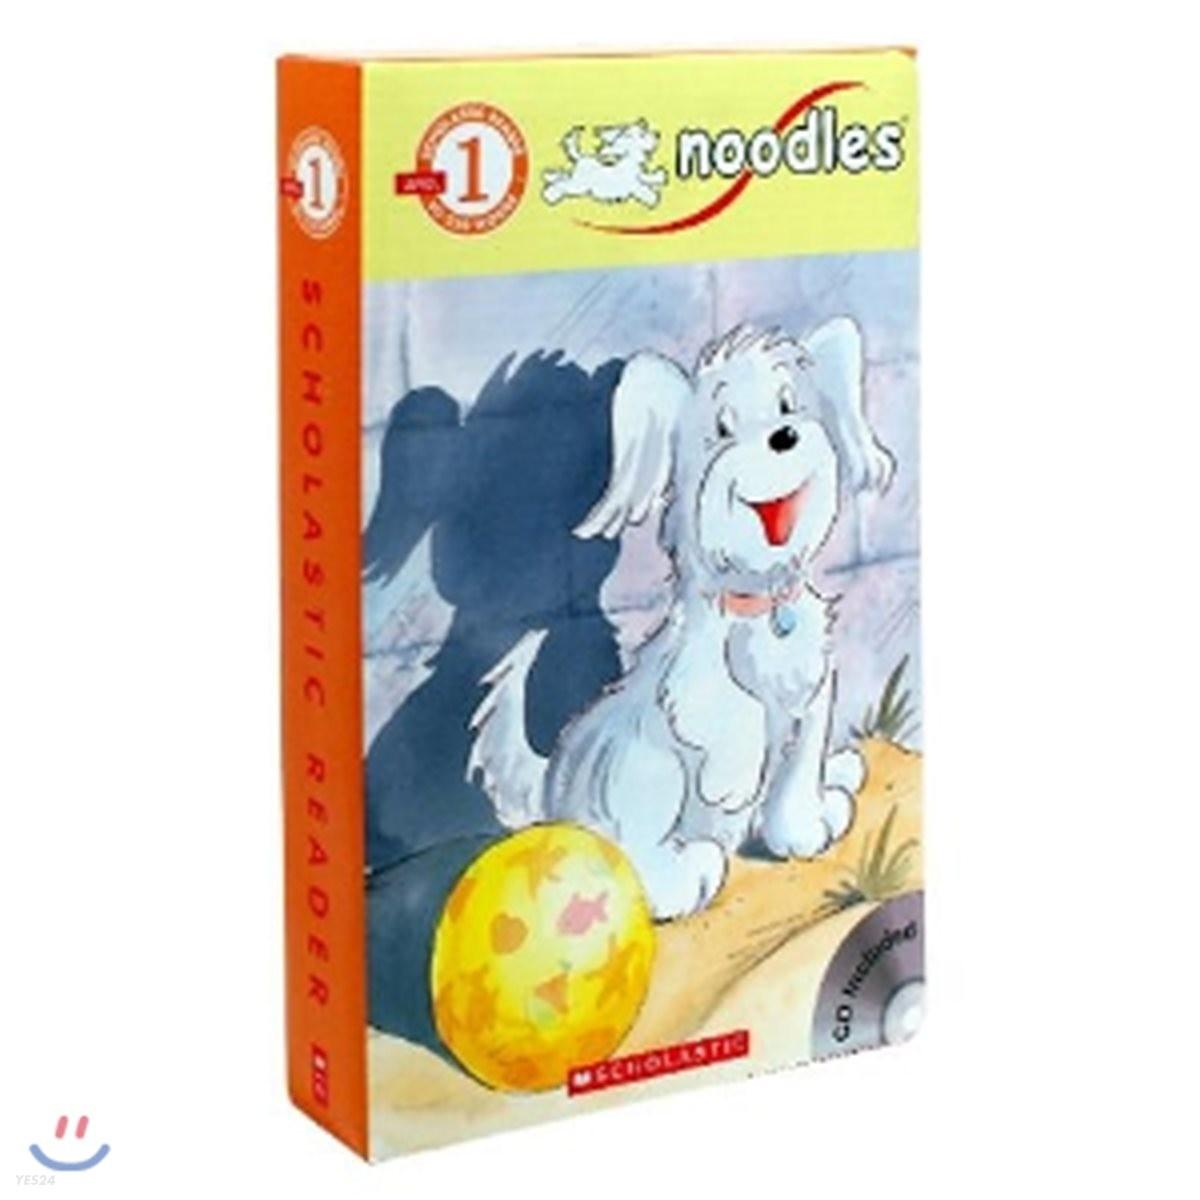 Noodles 스콜라스틱 리더스 누들스 세트 (10 Book + CD)